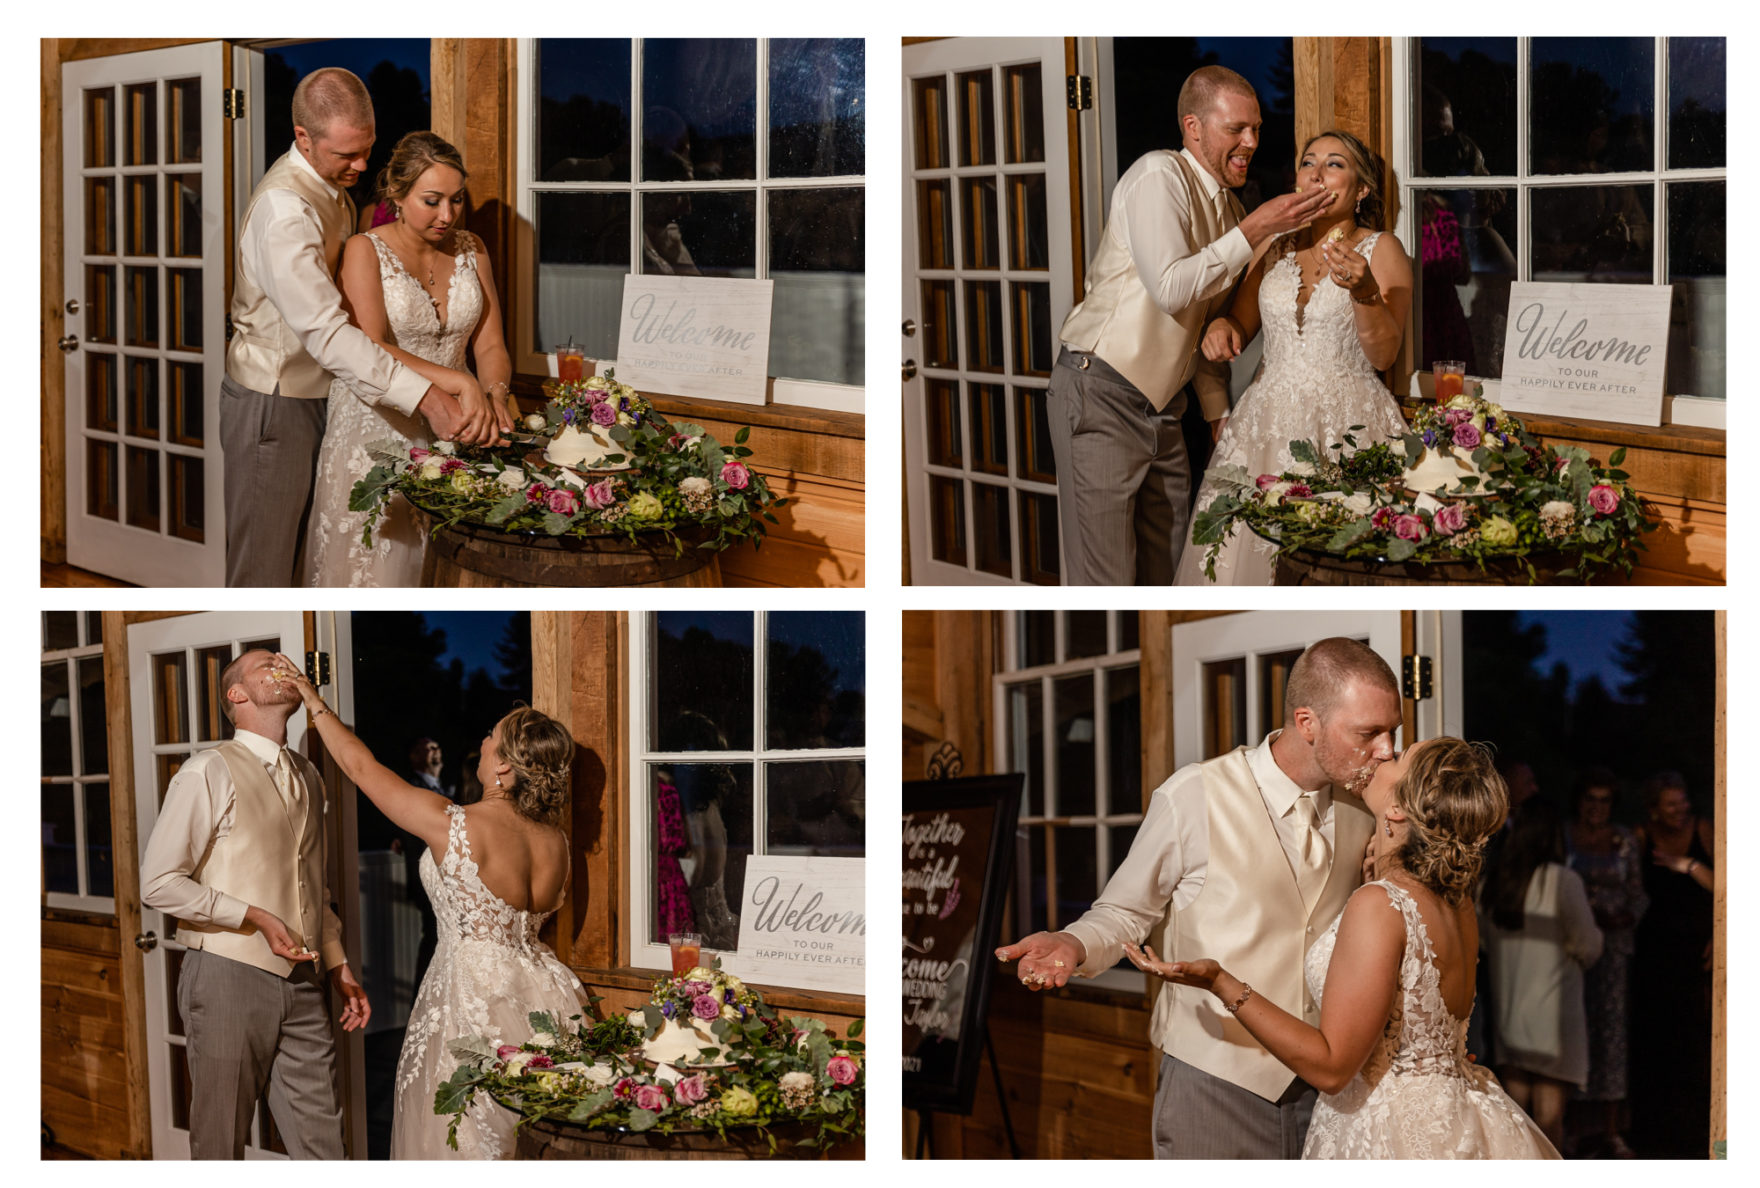 Summer Wedding Stone Ridge Hollow June Wedding Lavender dresses barn reception cake smash